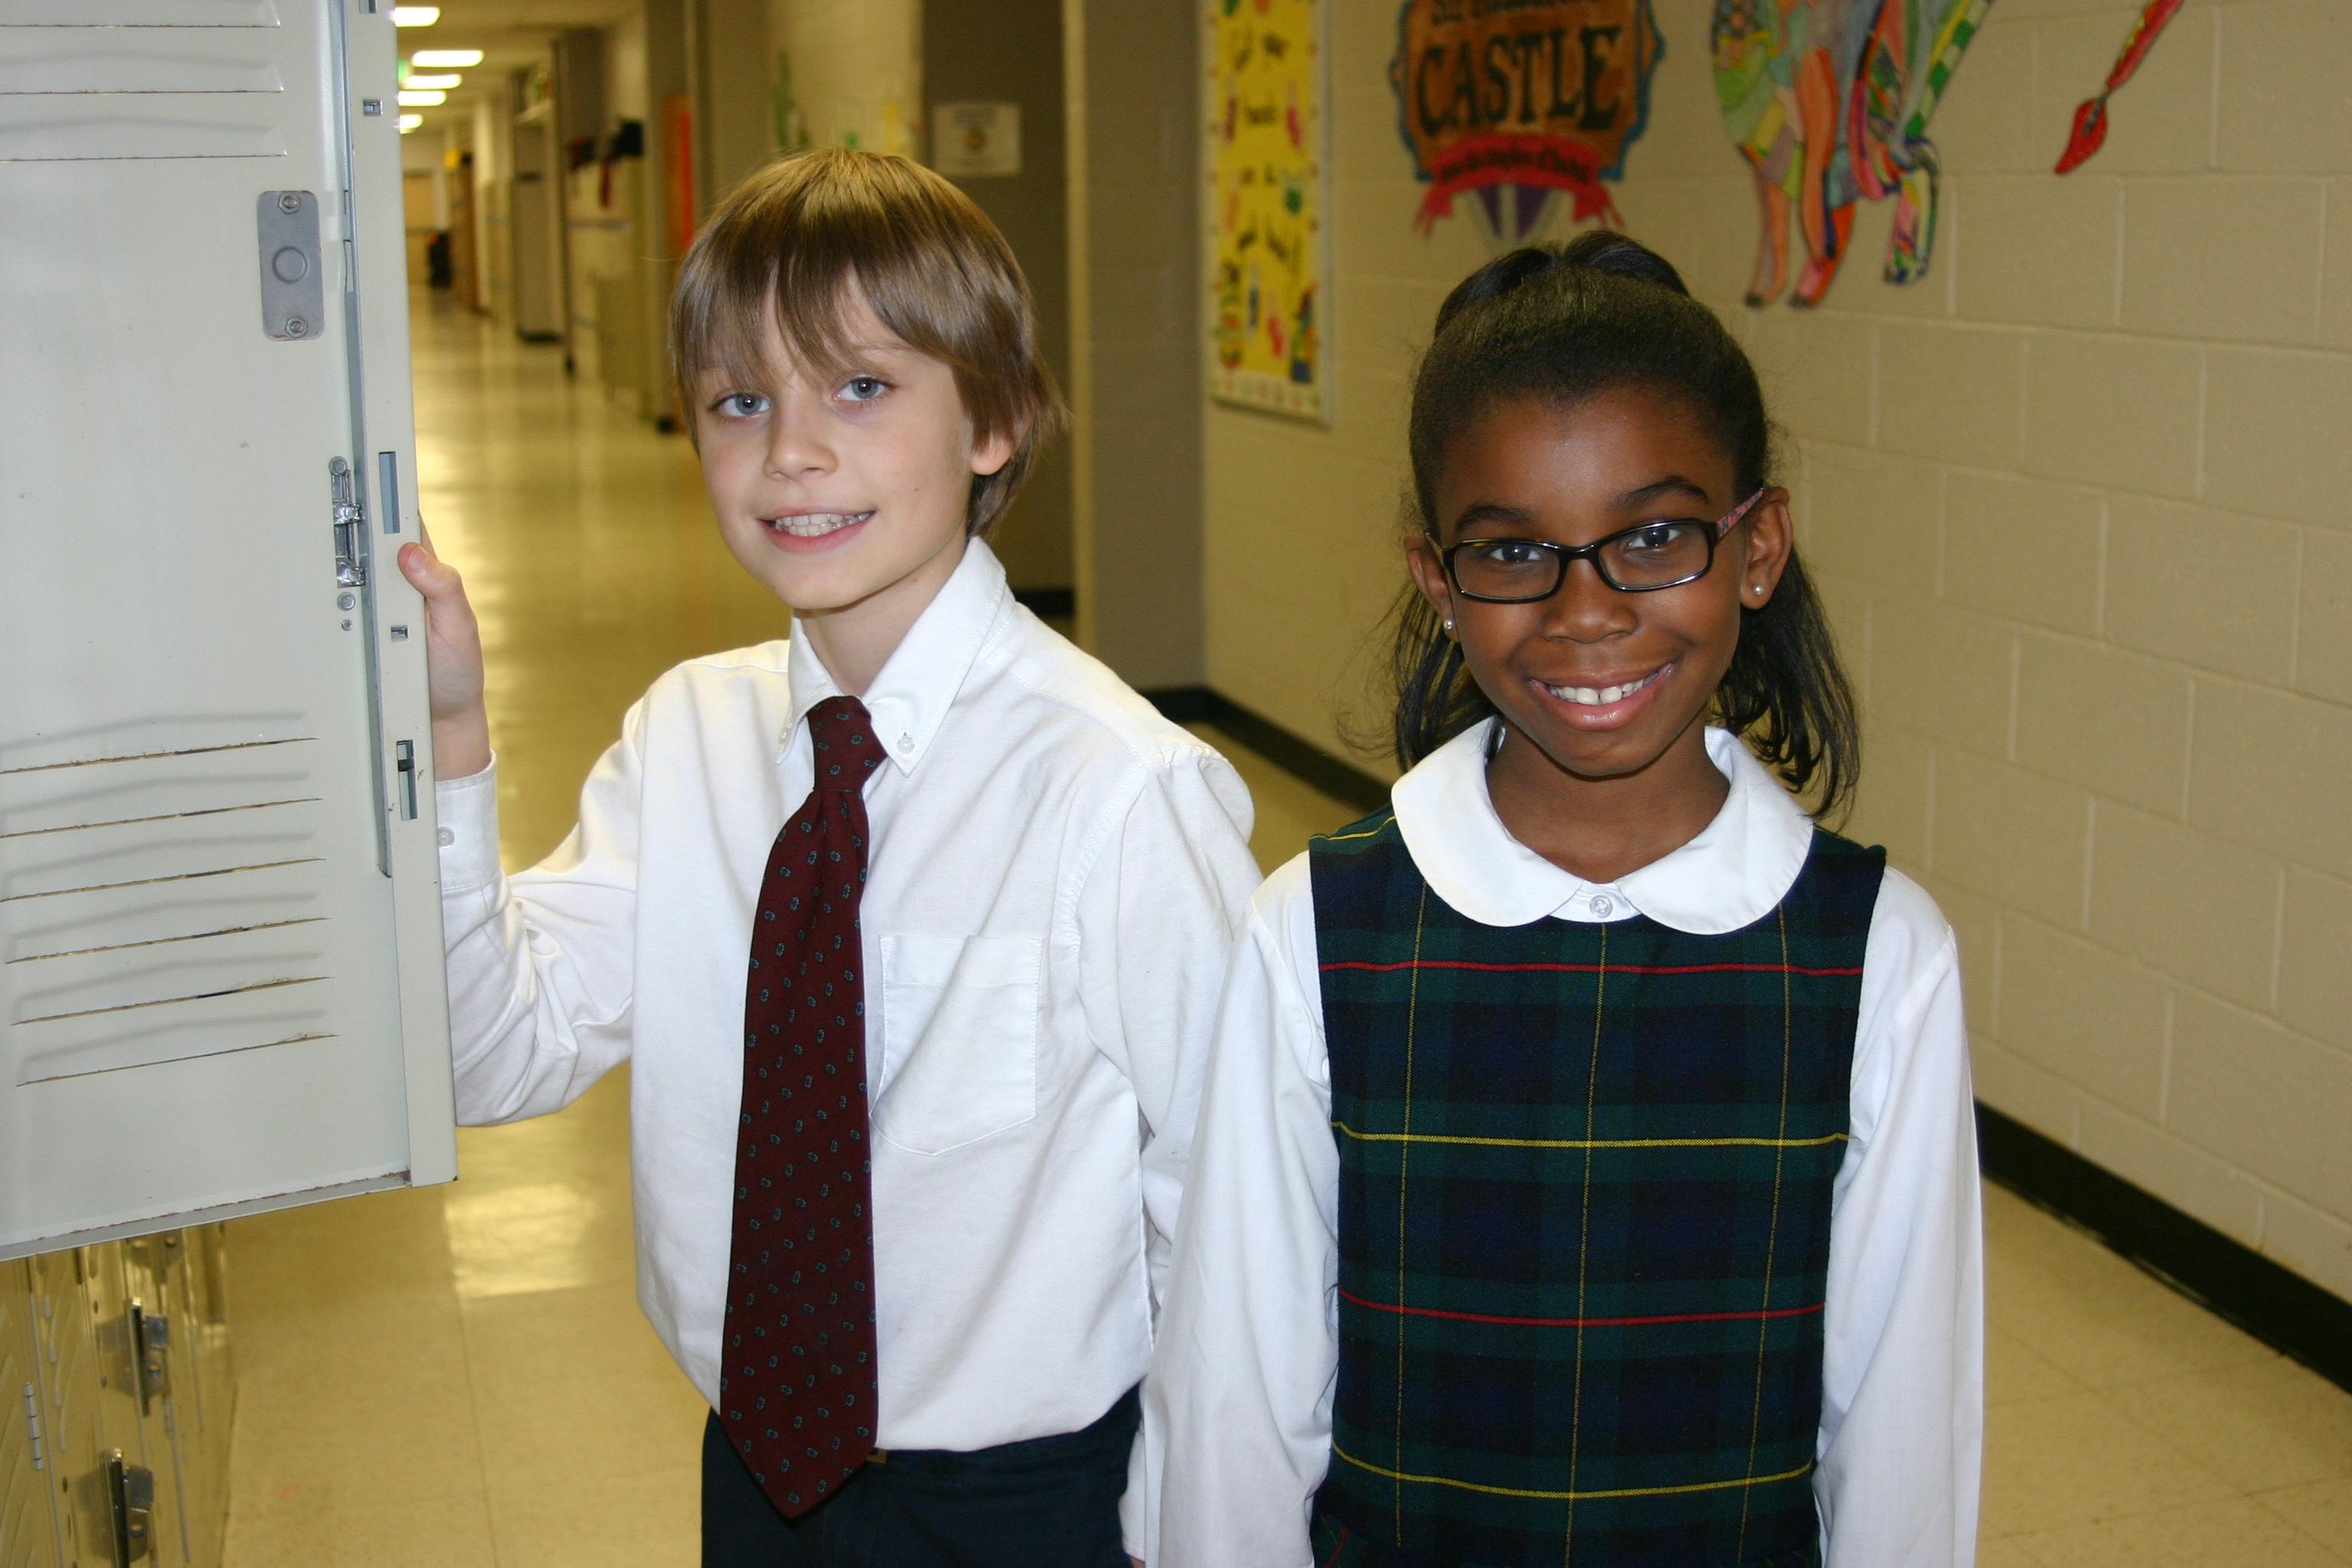 Advantages and Disadvantages of School Uniforms